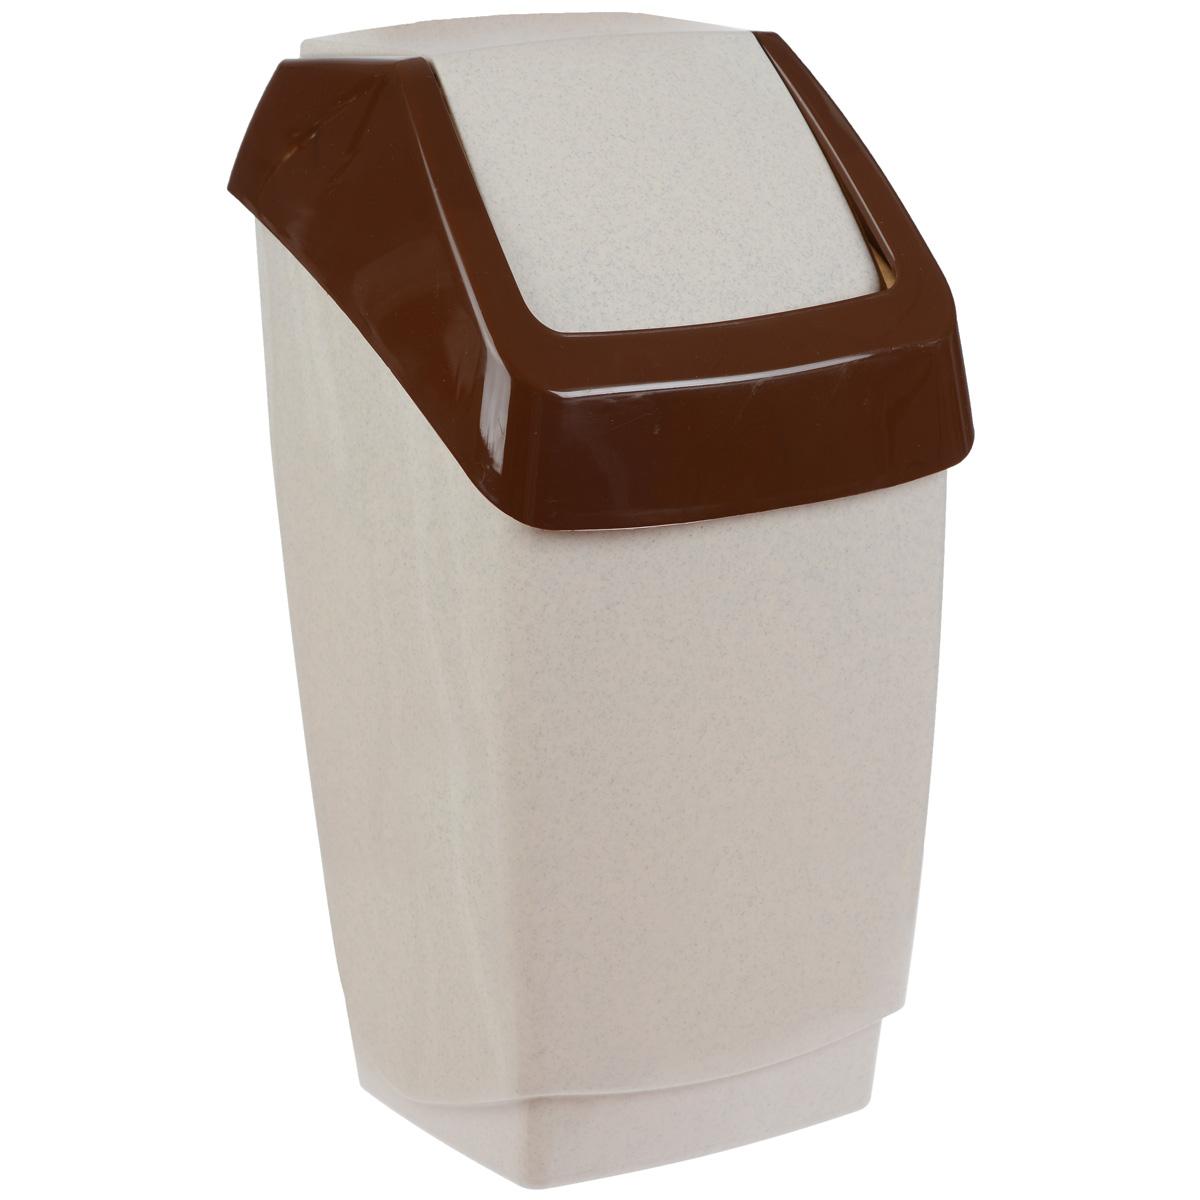 "Контейнер для мусора Idea ""Хапс"", цвет: бежевый мрамор, 7 л"